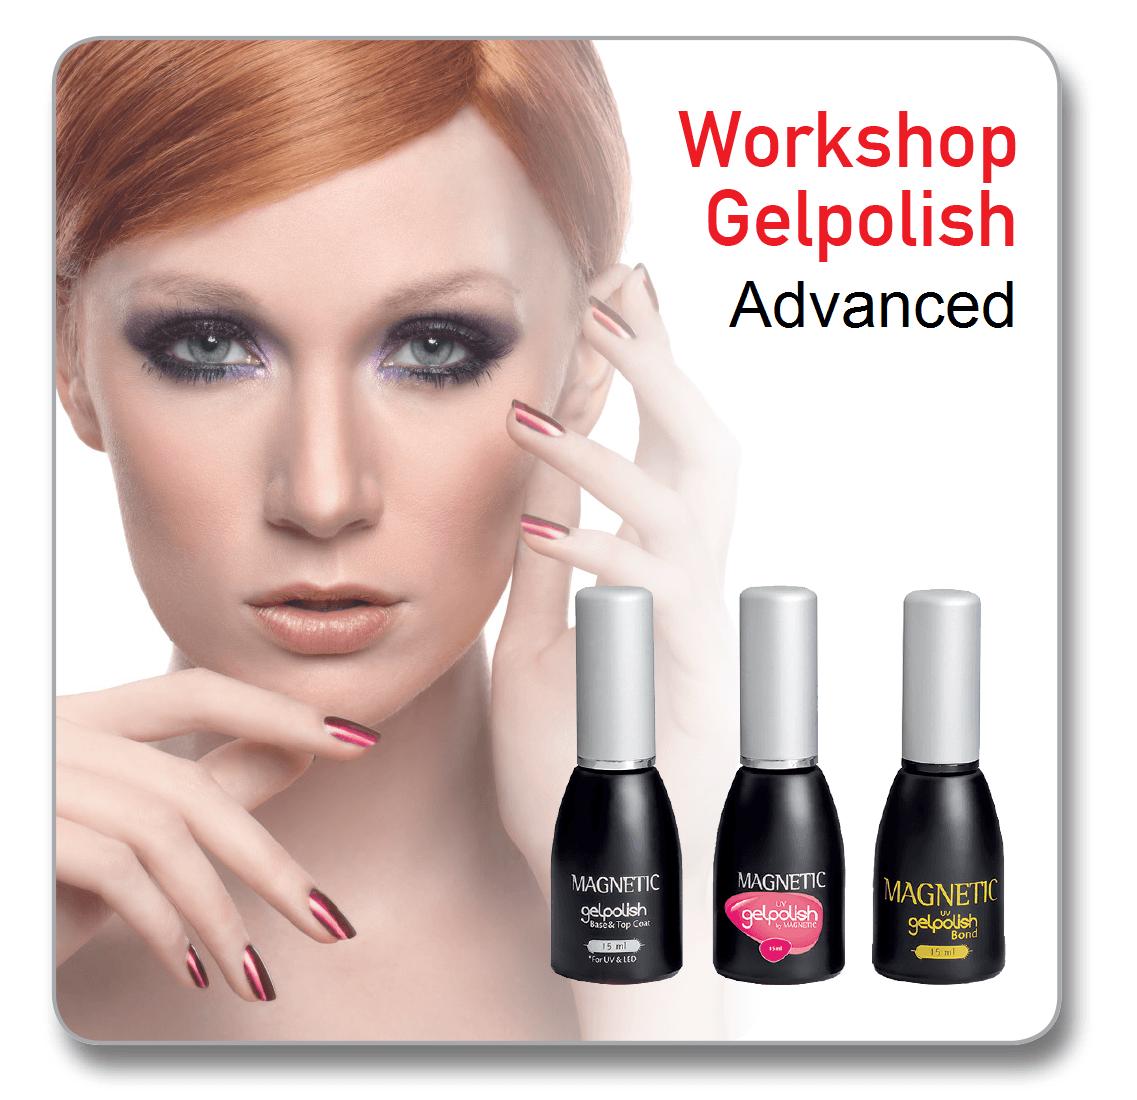 Workshop Gelpolish